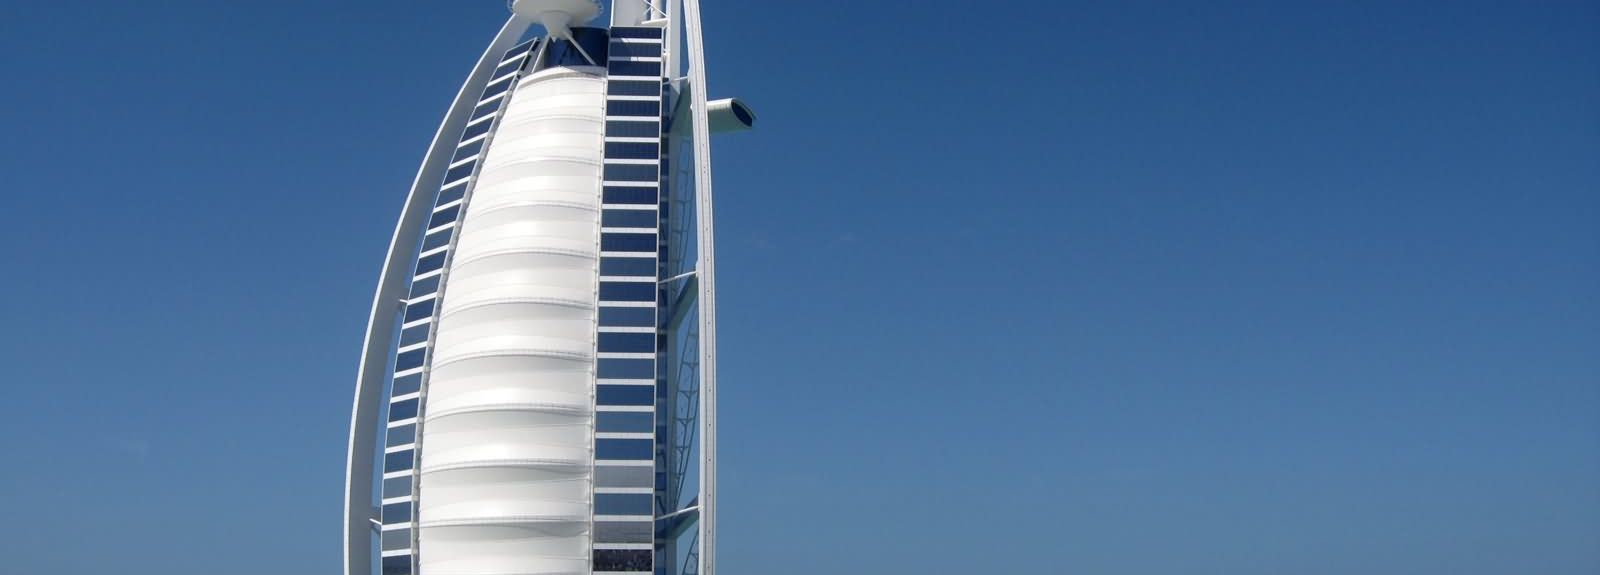 Al Barsha - Dubai - United Arab Emirates